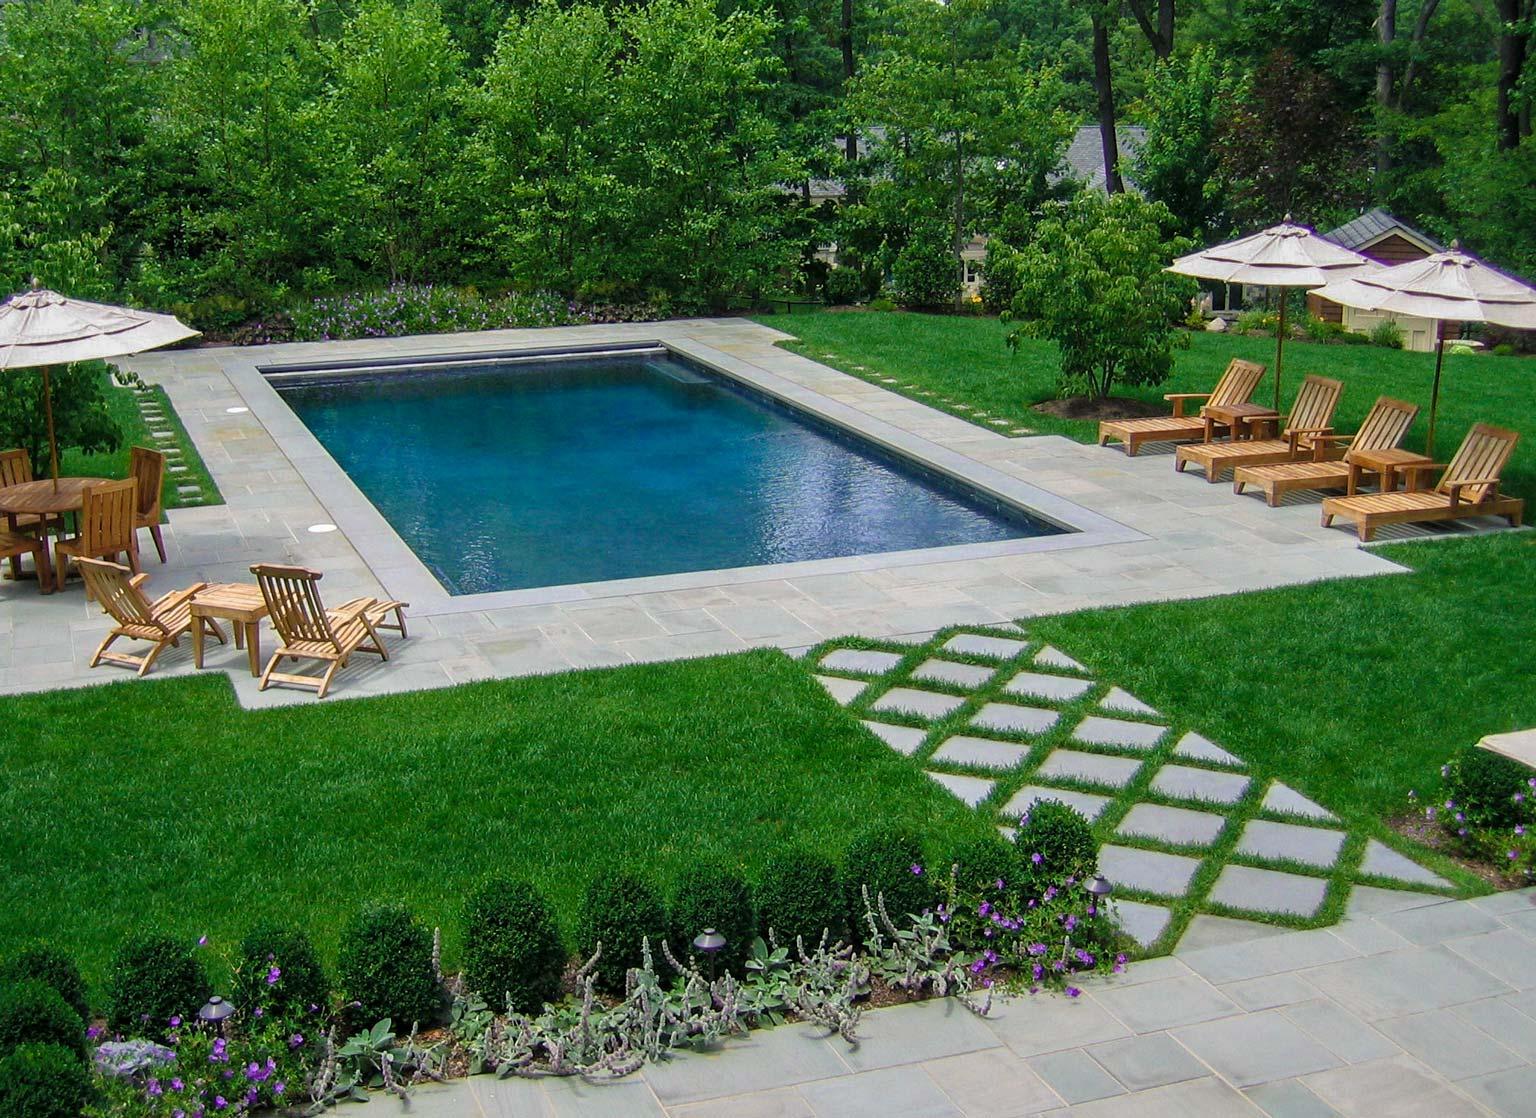 Fullsize Of Backyard Landscape Ideas With Pool